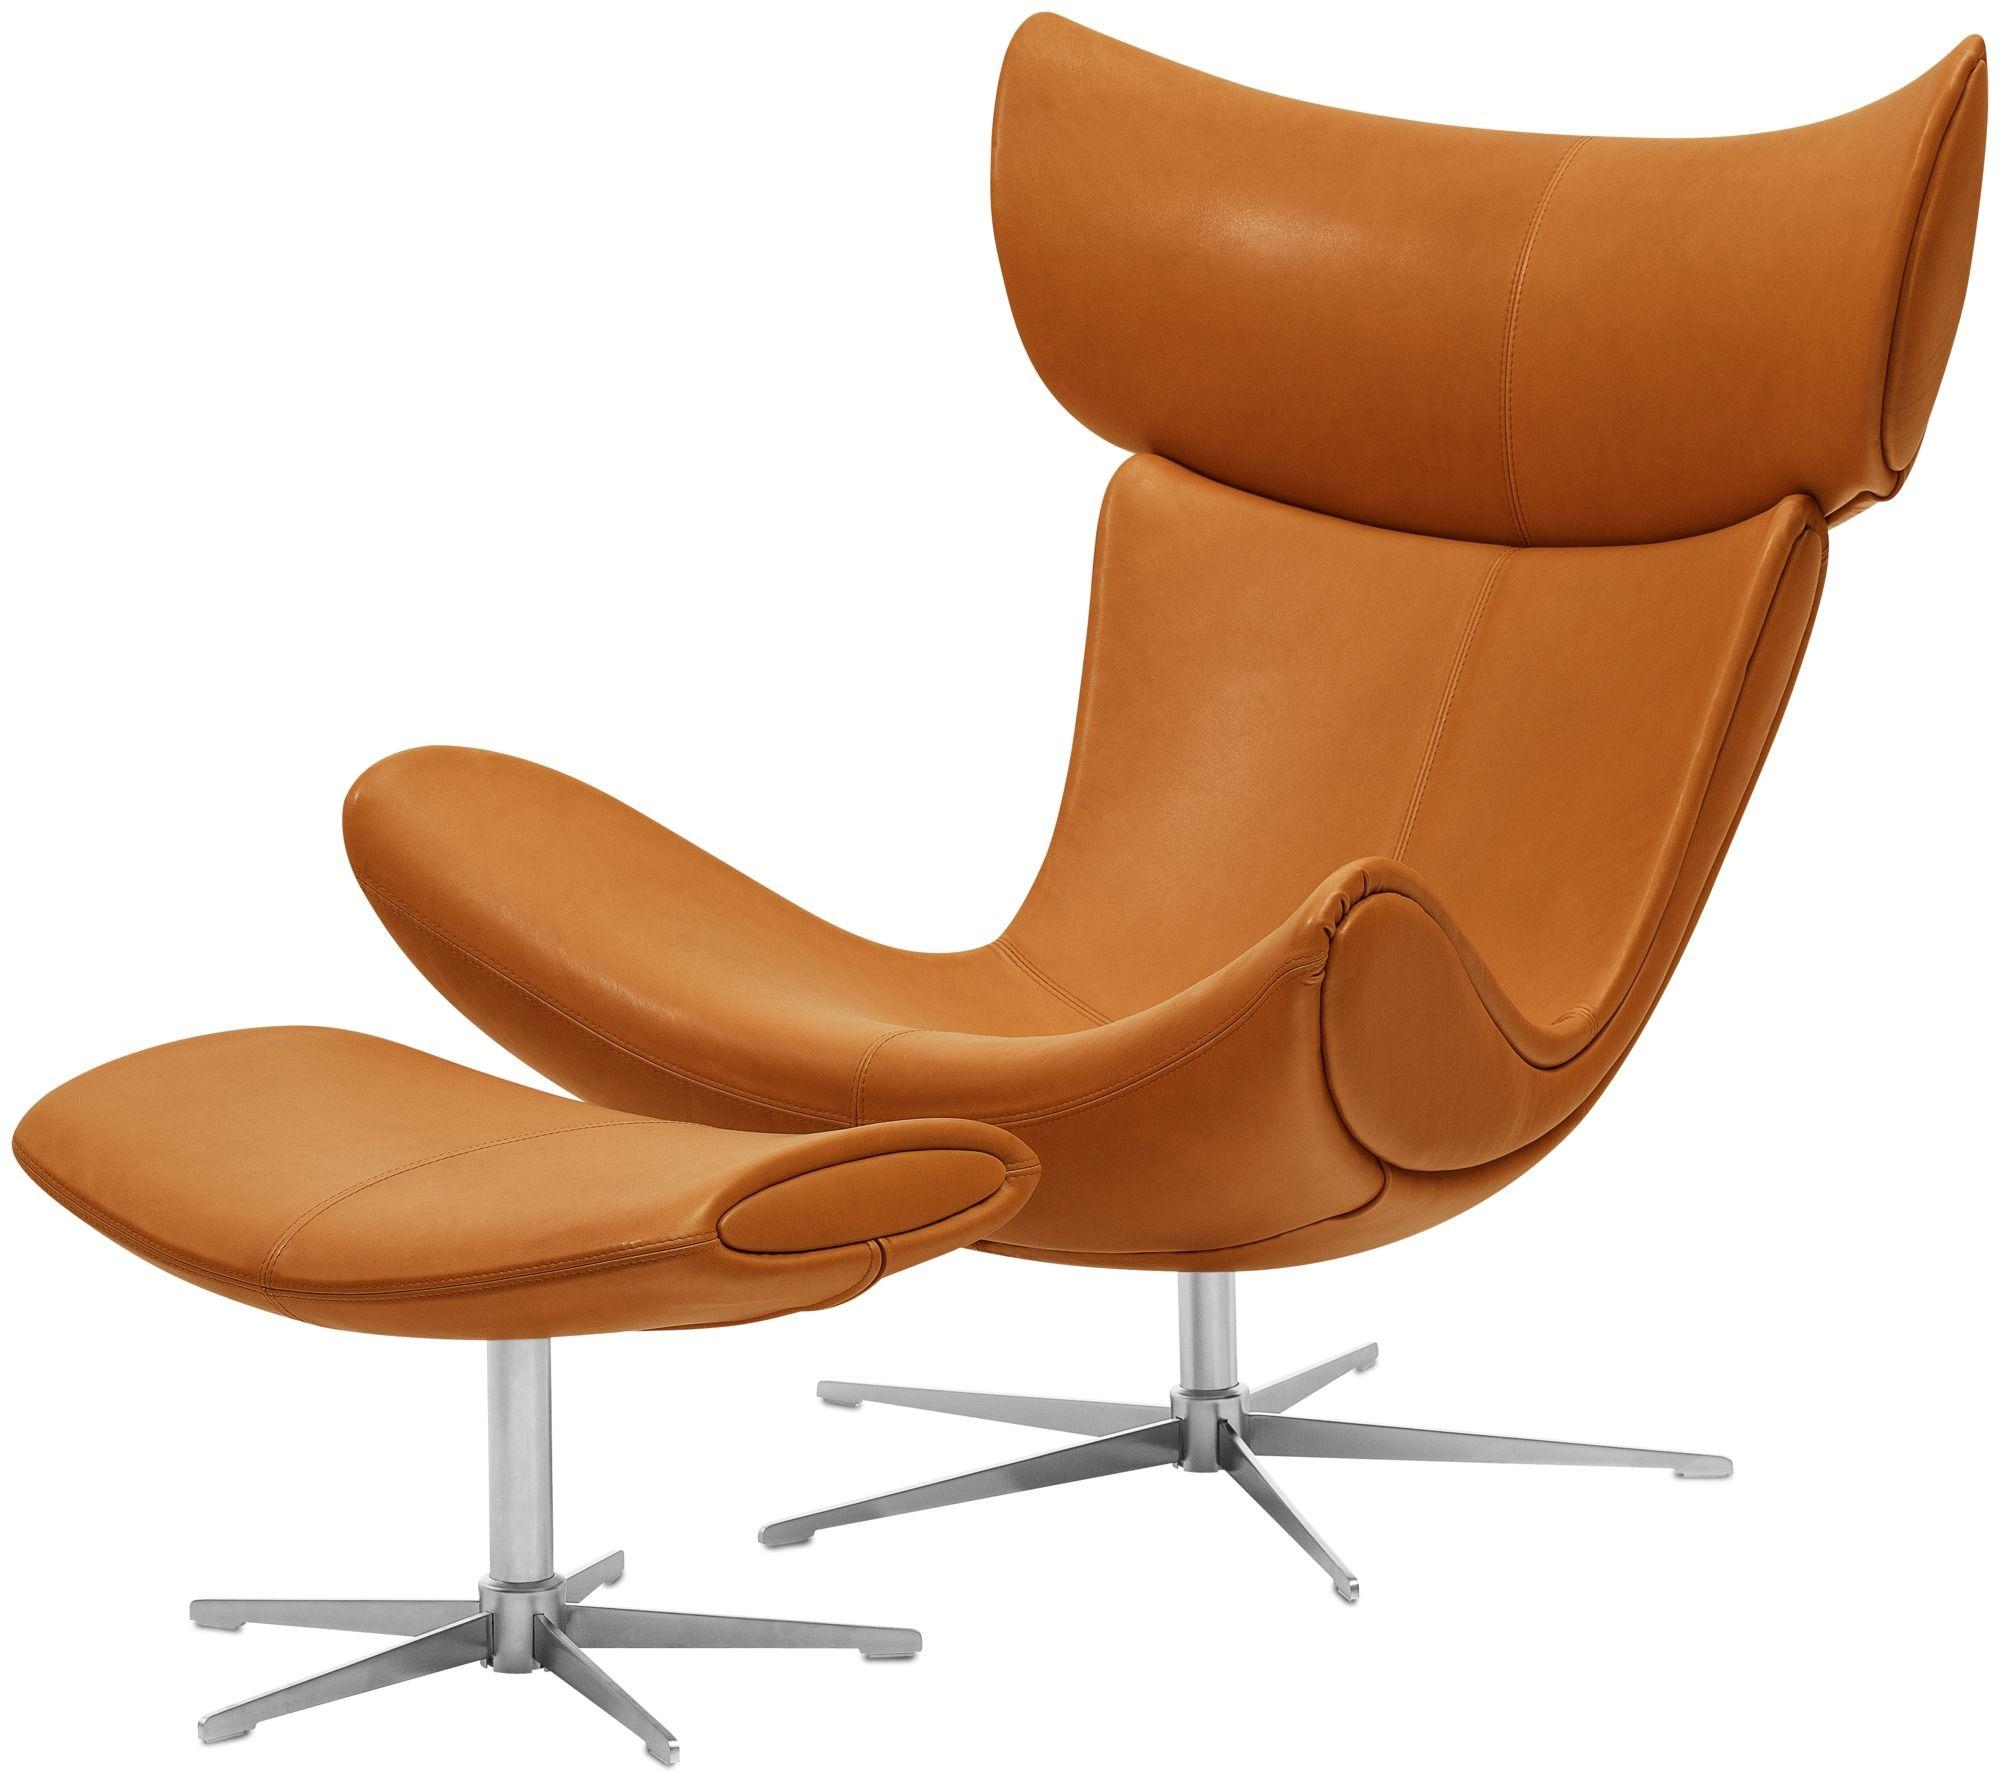 Fotele Nowoczesne Fotele Jakosc Z Boconcept With Images